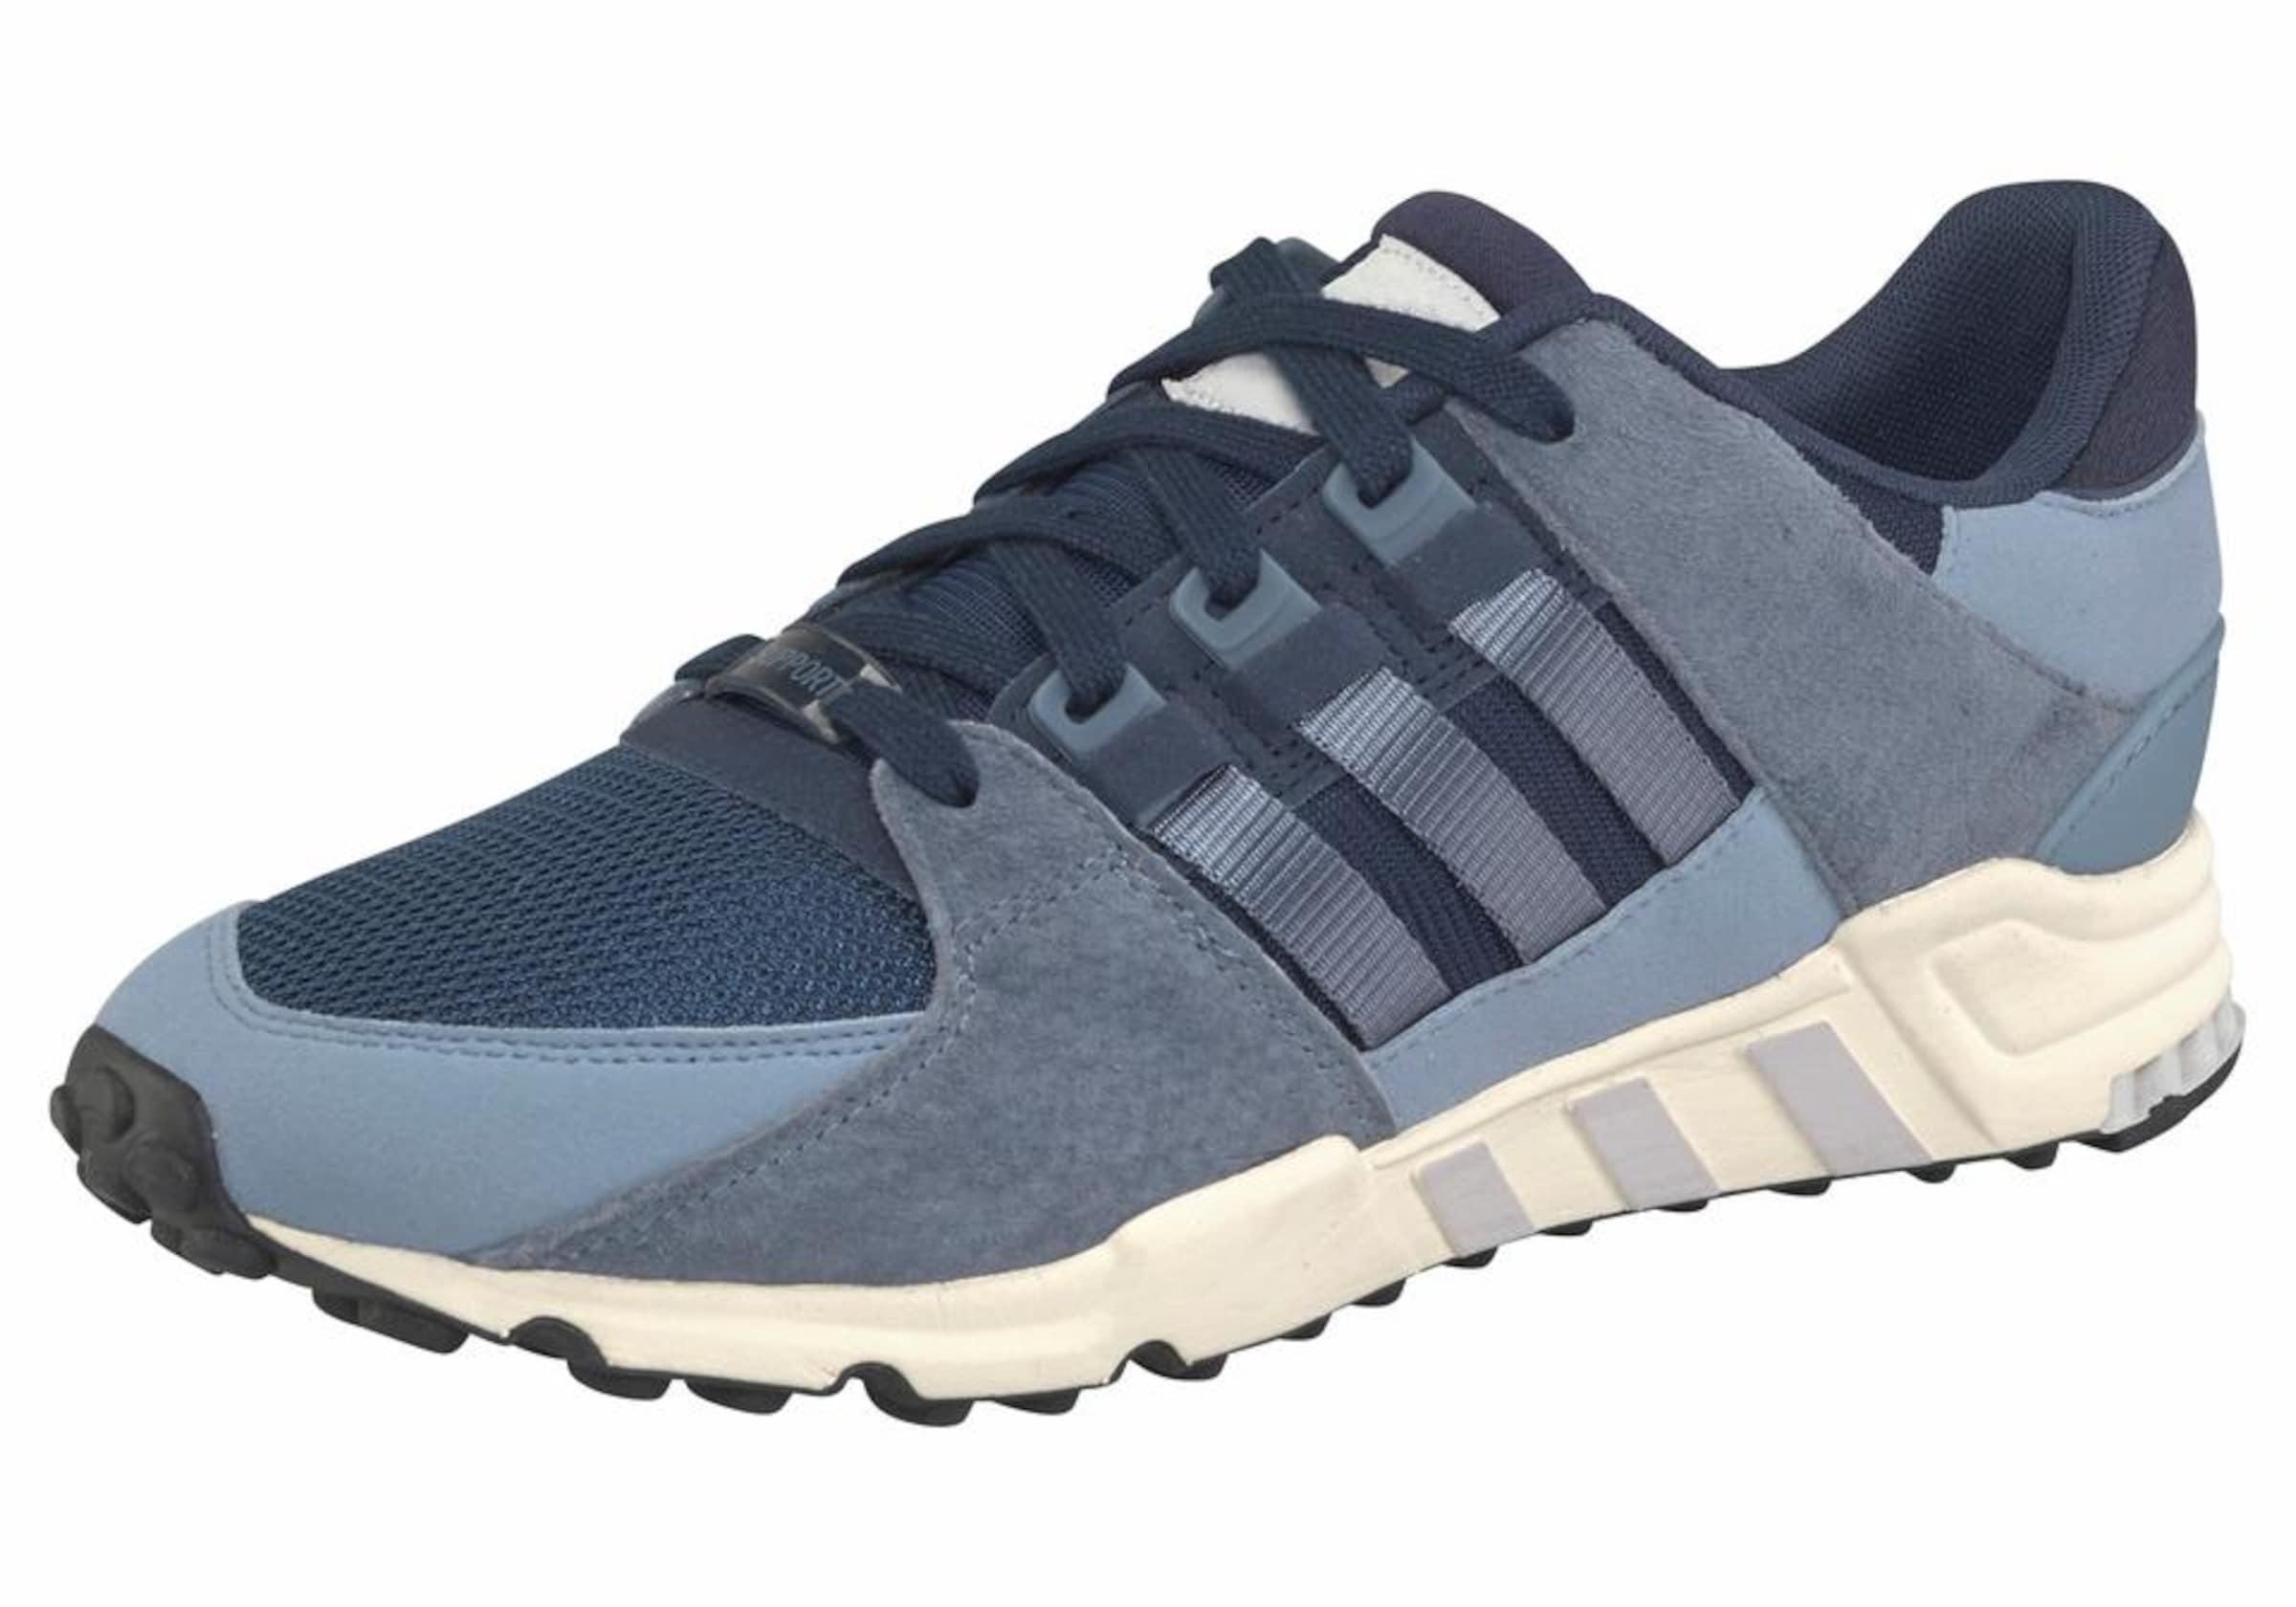 ADIDAS ORIGINALS Sneakers Equipment Support Hohe Qualität